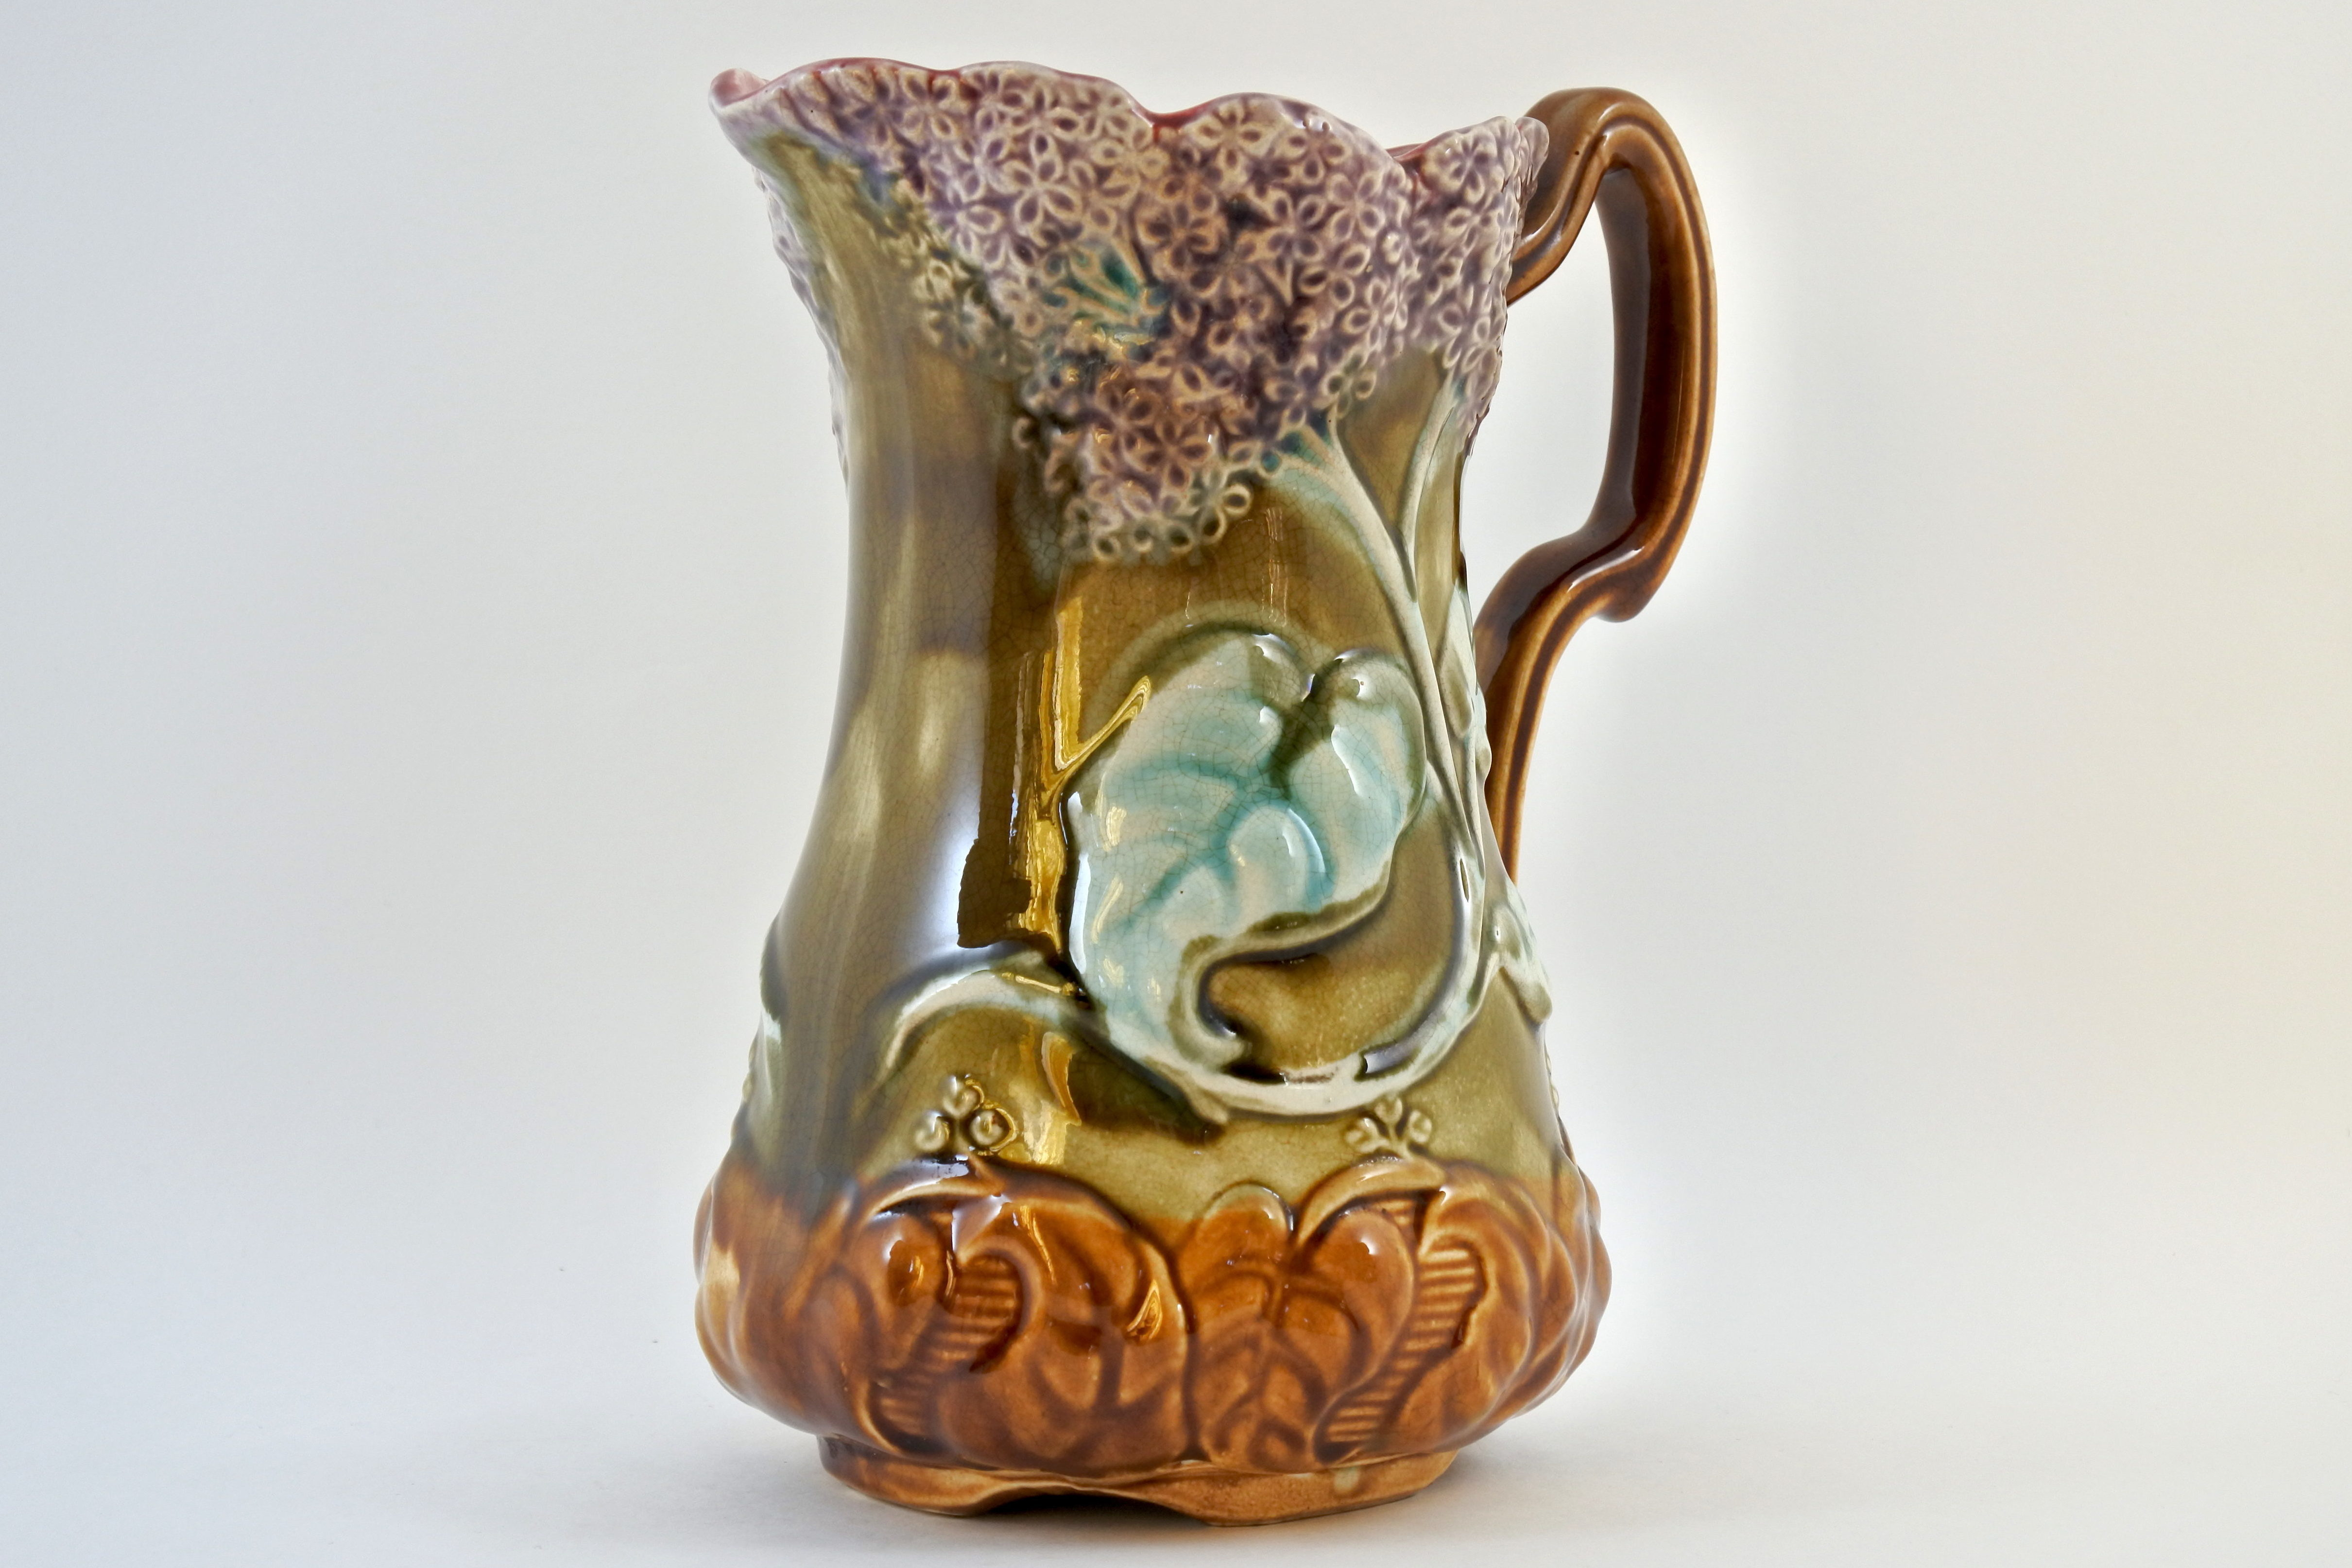 Brocca in ceramica barbotine con lillà - Onnaing n° 736